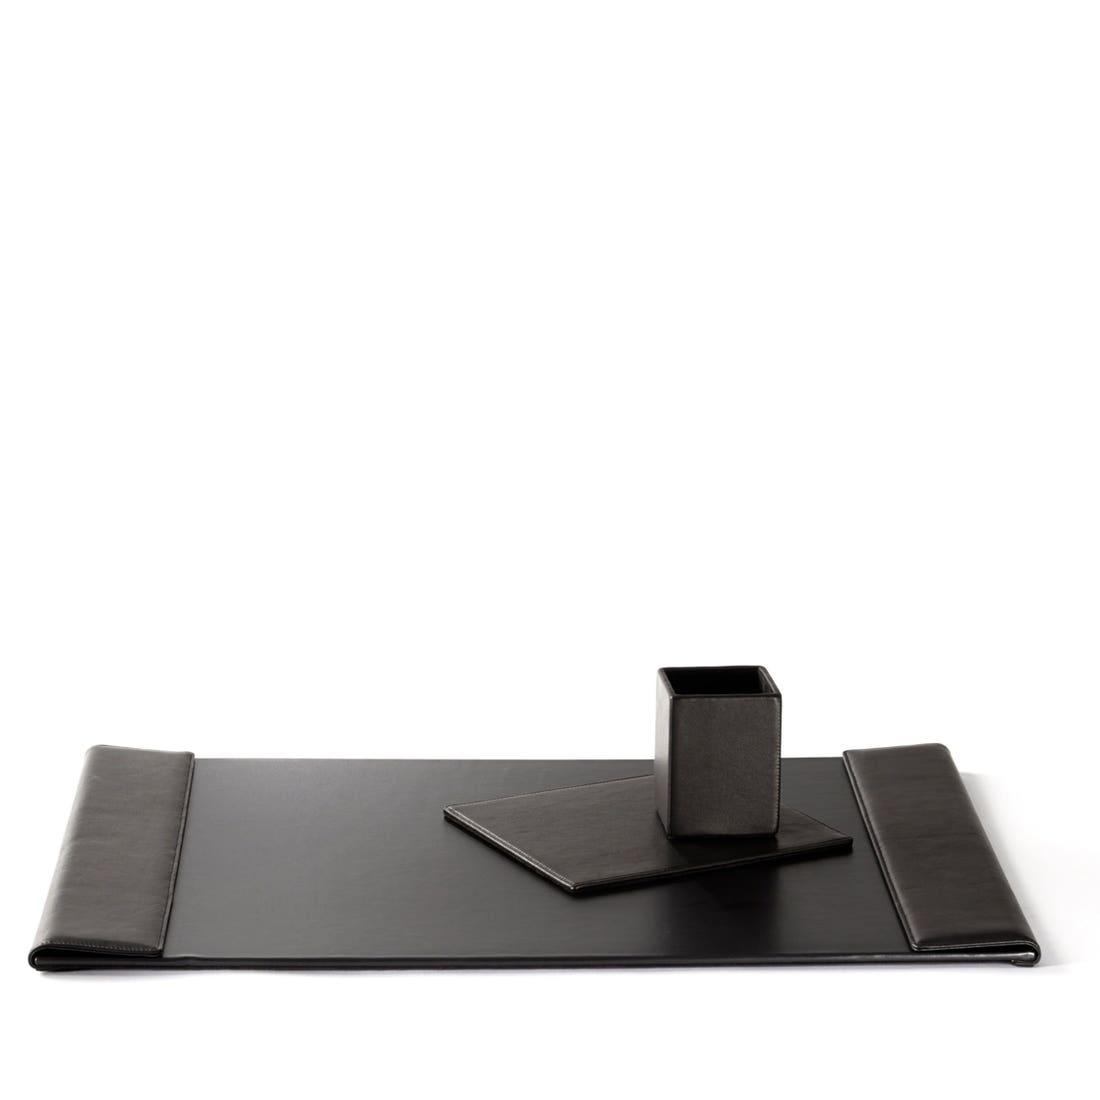 Classic Desk Accessories Set